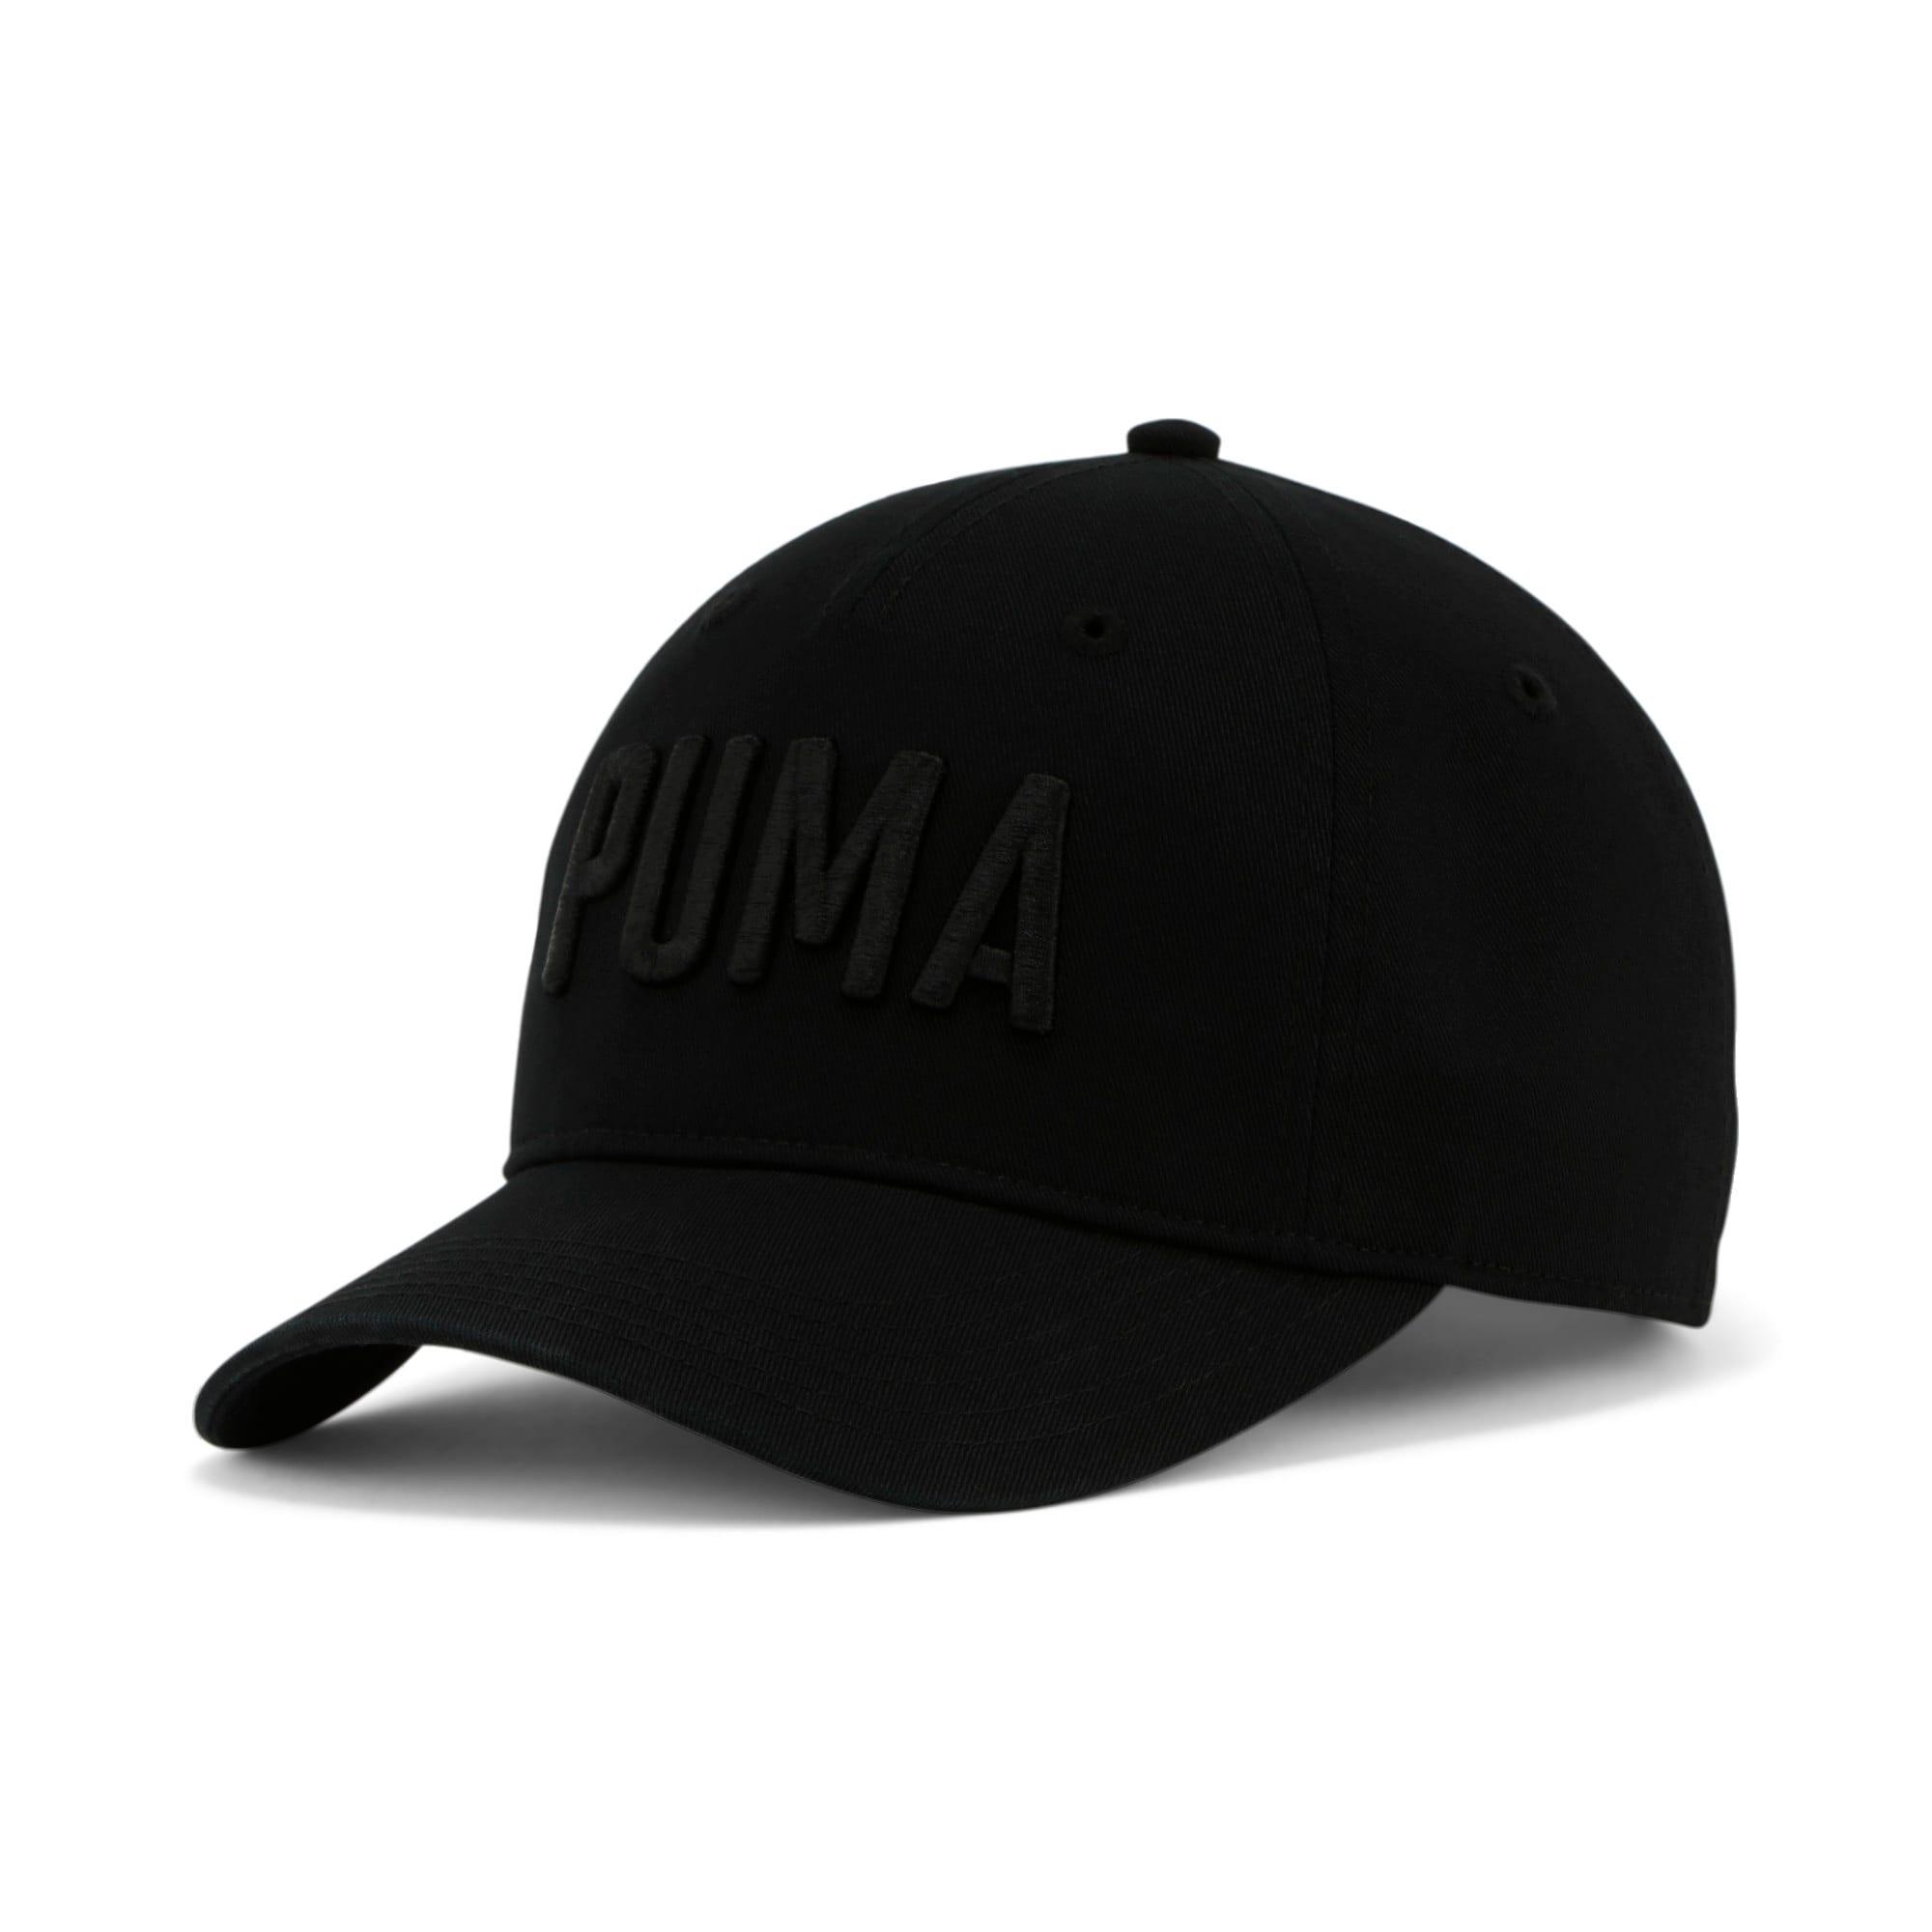 Thumbnail 1 of PUMA Classic Dad Cap, Black, medium